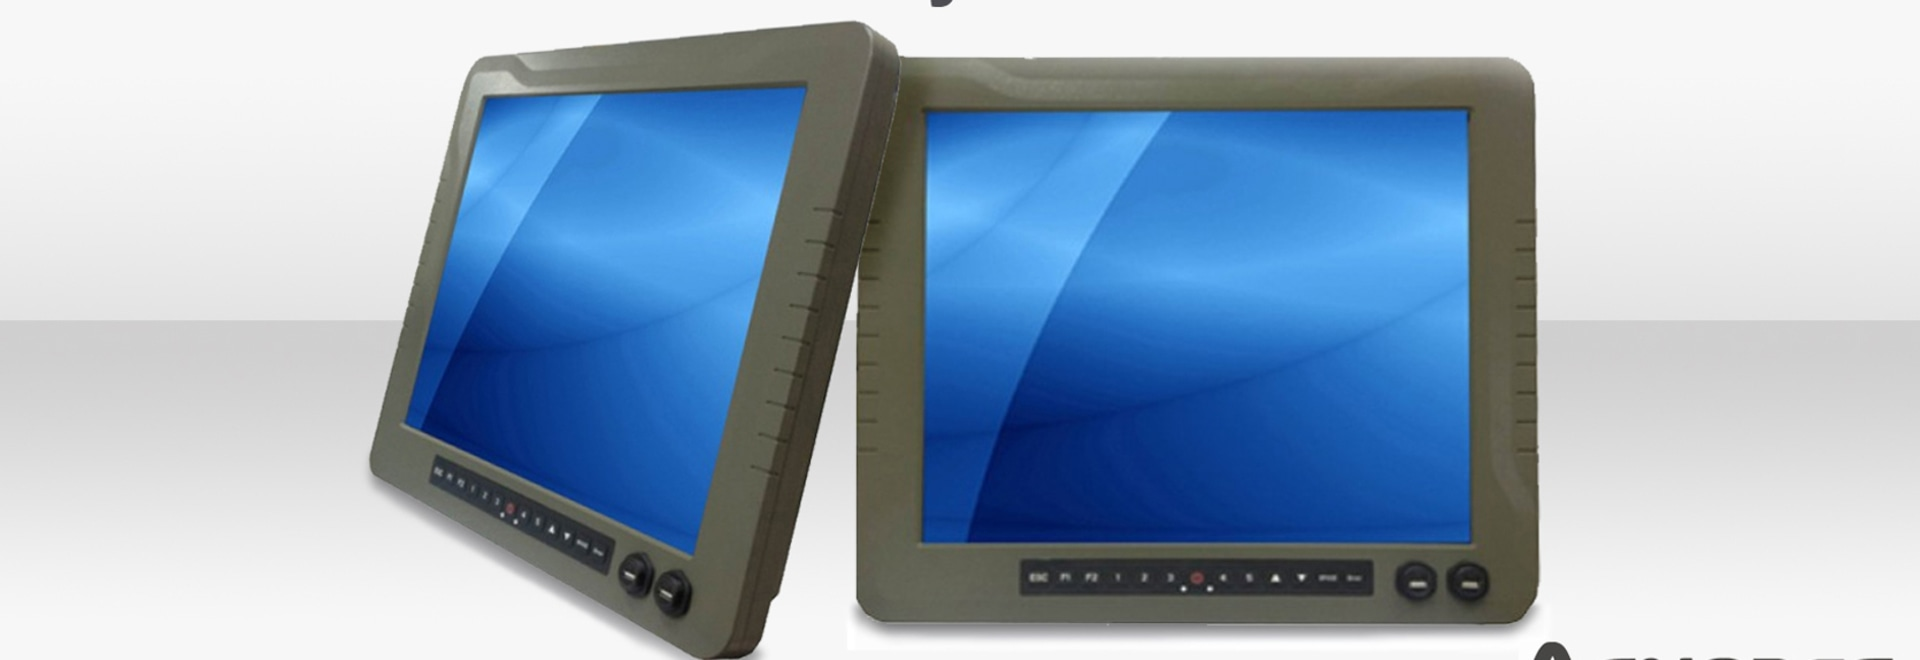 19-Zoll-Militärgrad -Panel-PC-Funktionen 6. Generation Core-i7-6600U 2.6GHz CPU In Vollständig IP67 Robustes Gehäuse